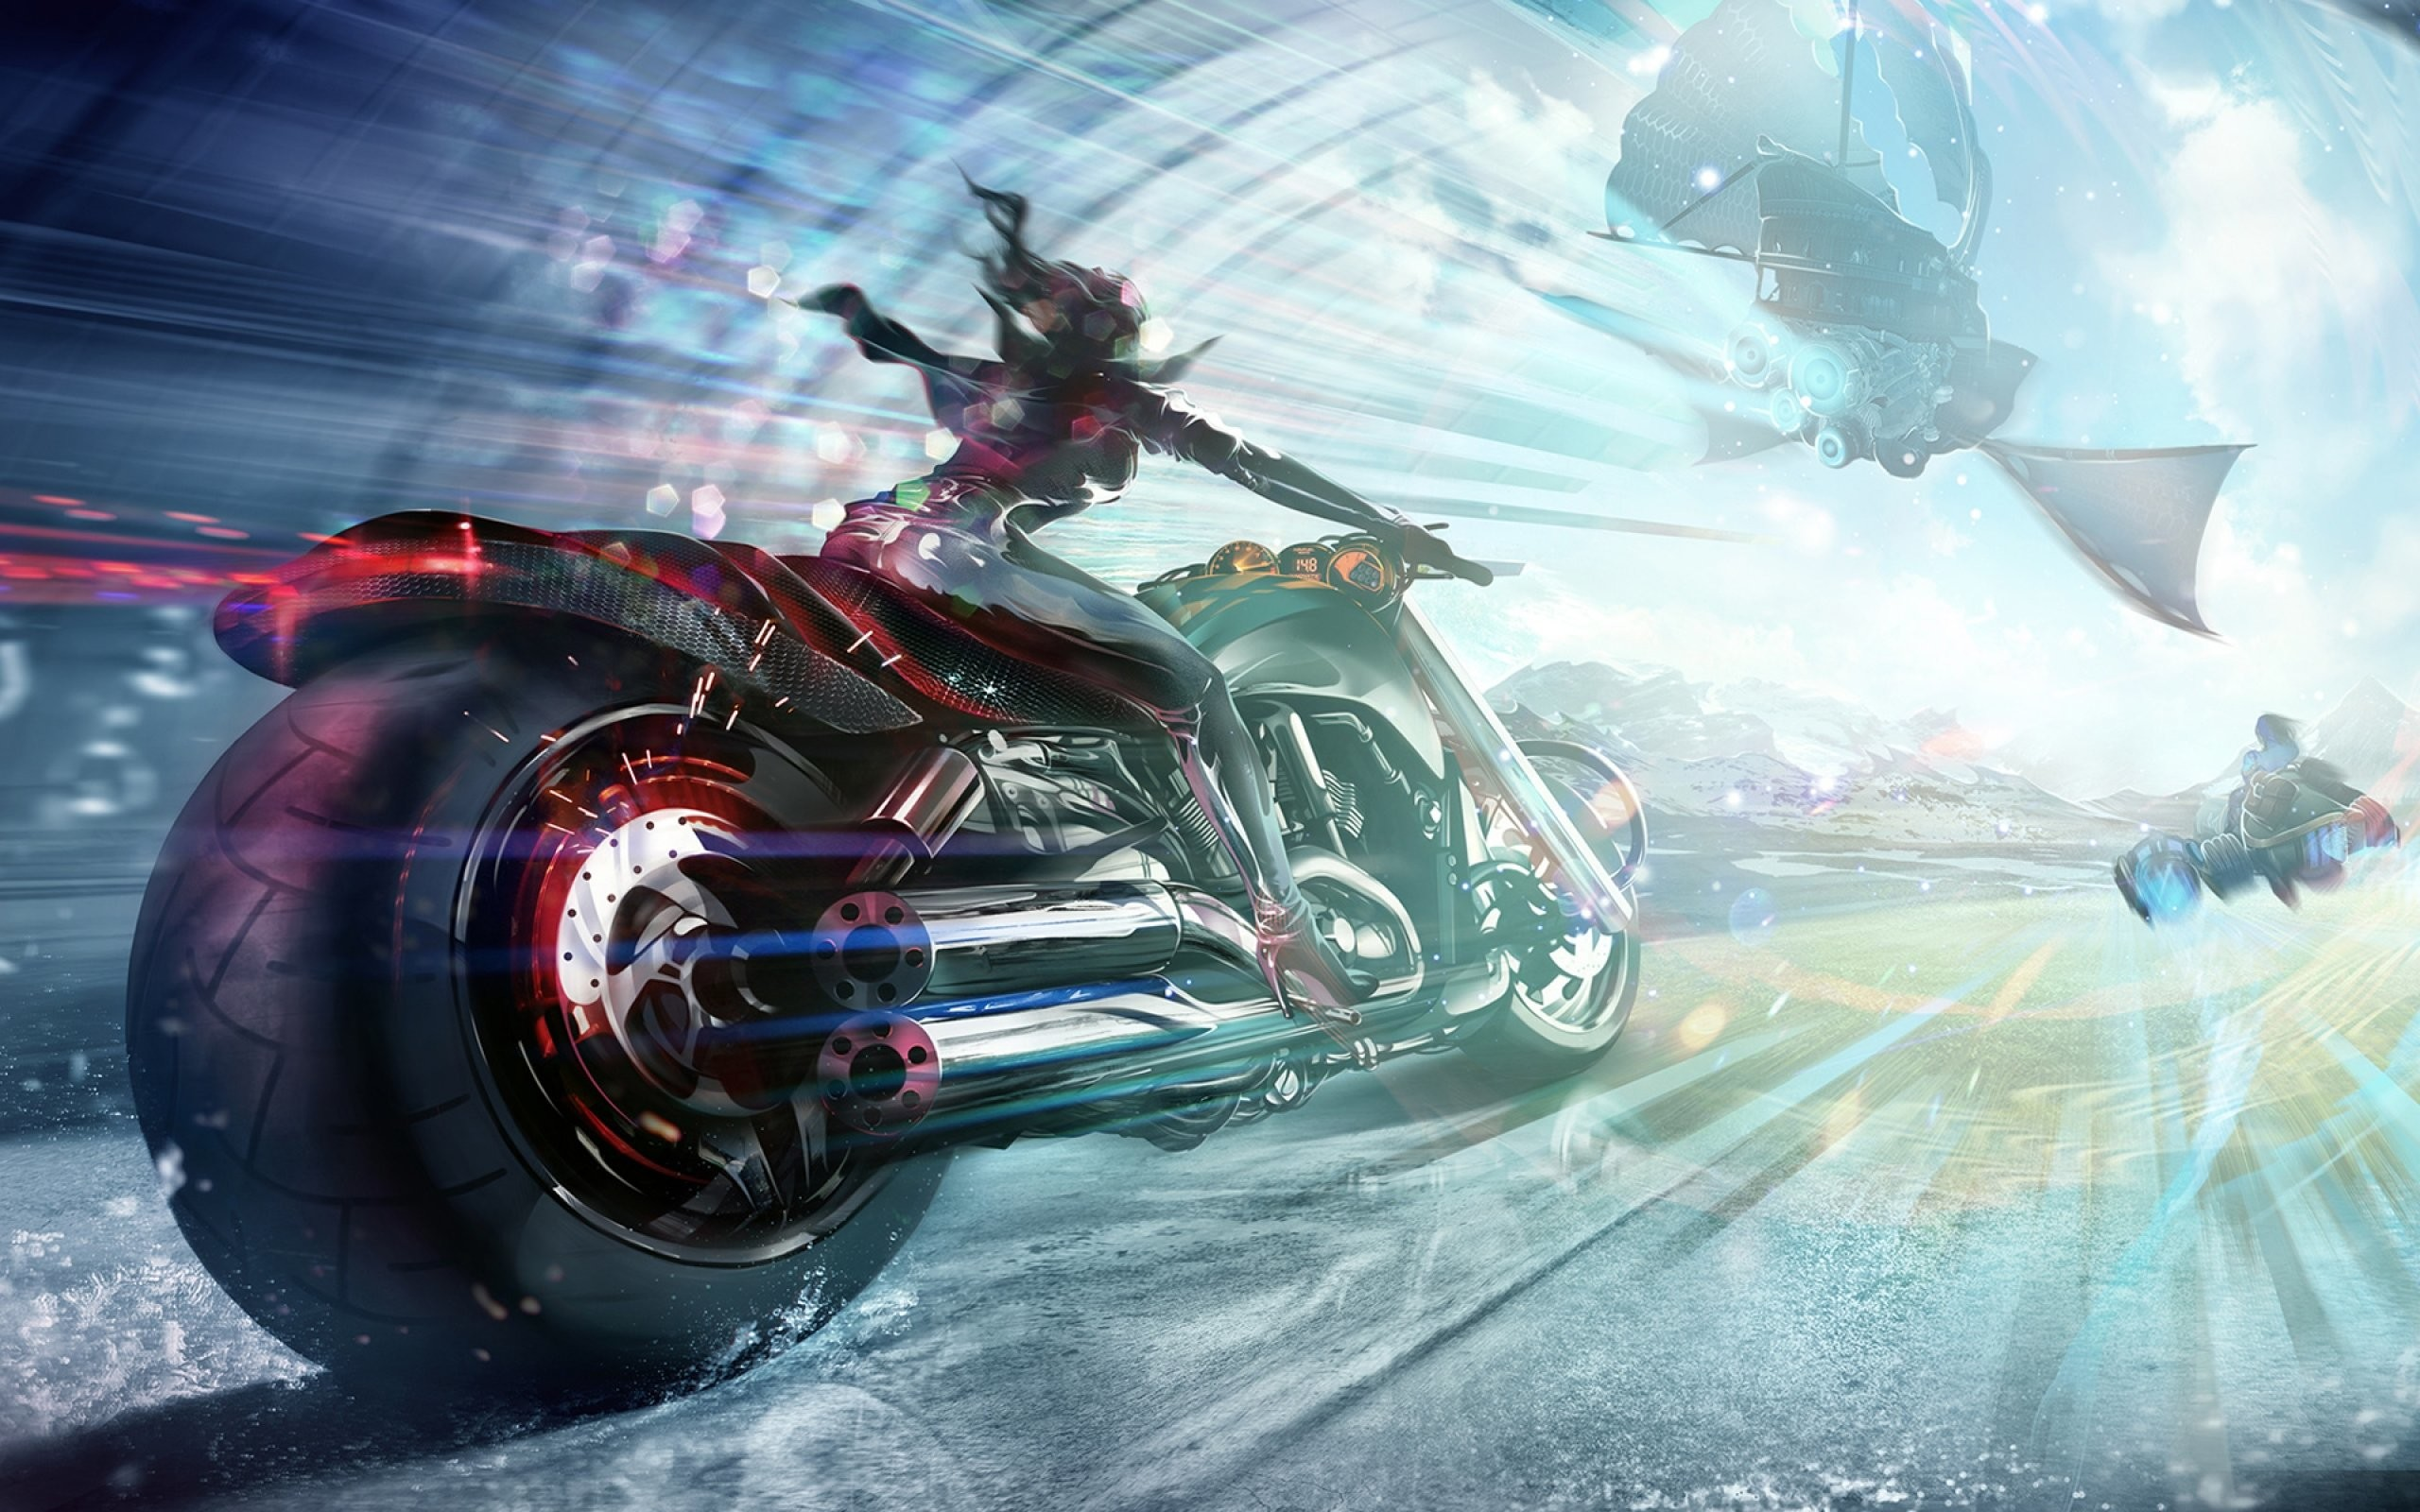 Sci-fi art artwork motorbike chopper girl motorcycle bike spaceship  wallpaper     684053   WallpaperUP